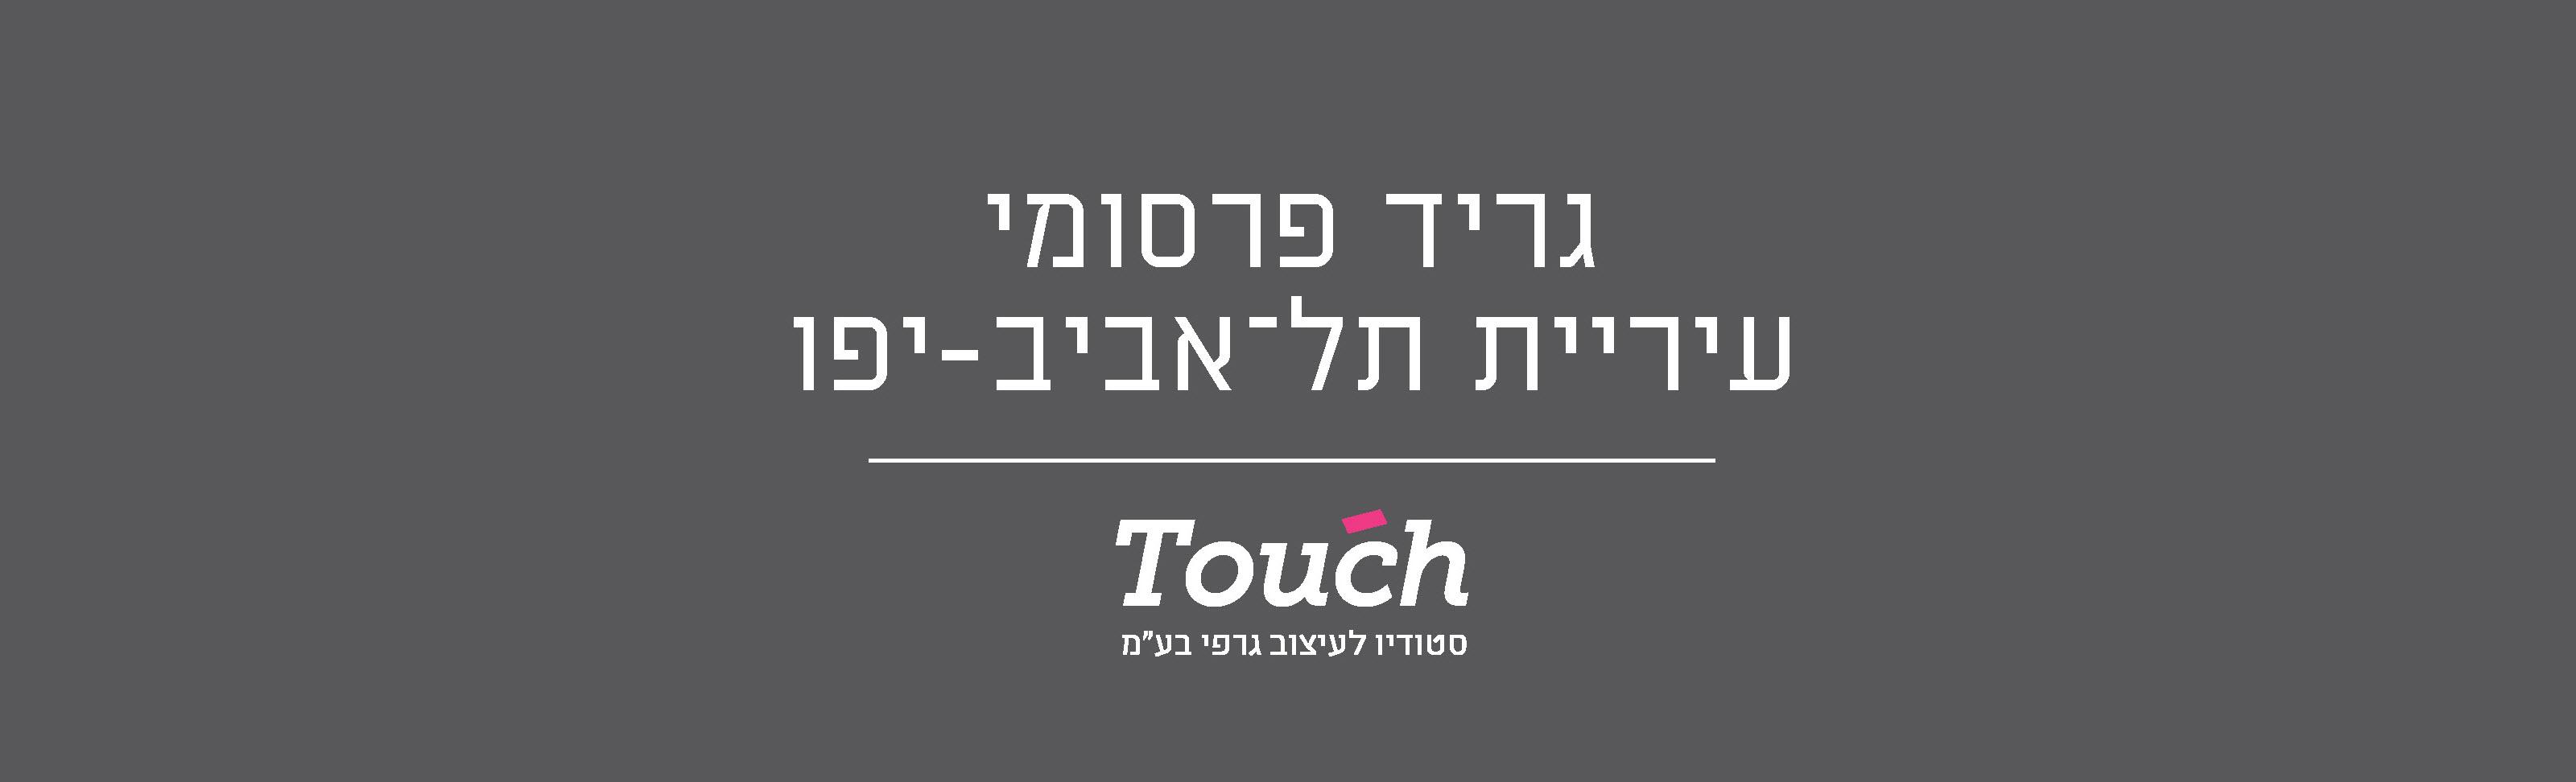 סטודיו Touch